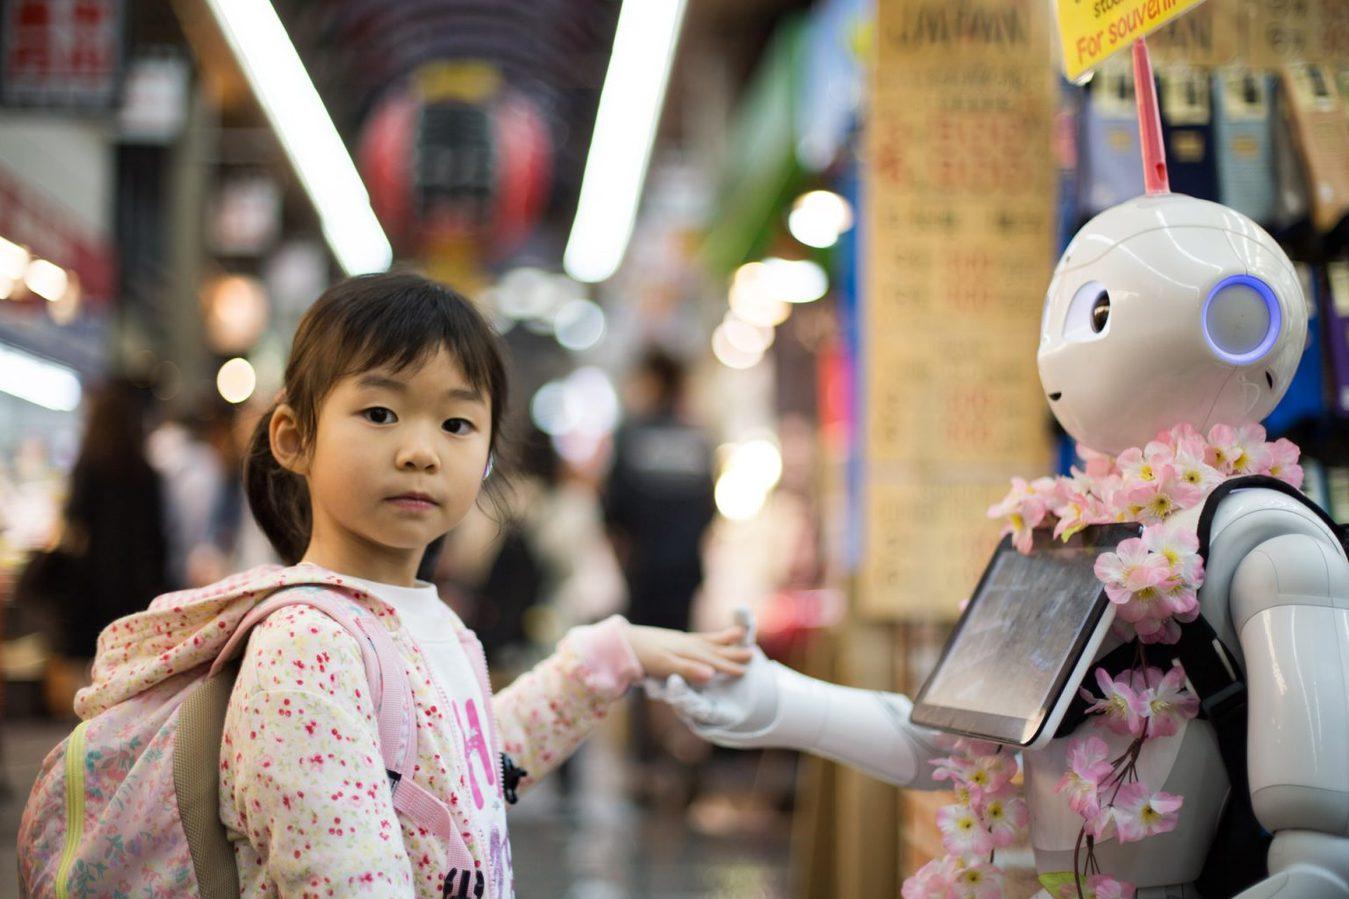 A girl with a robot